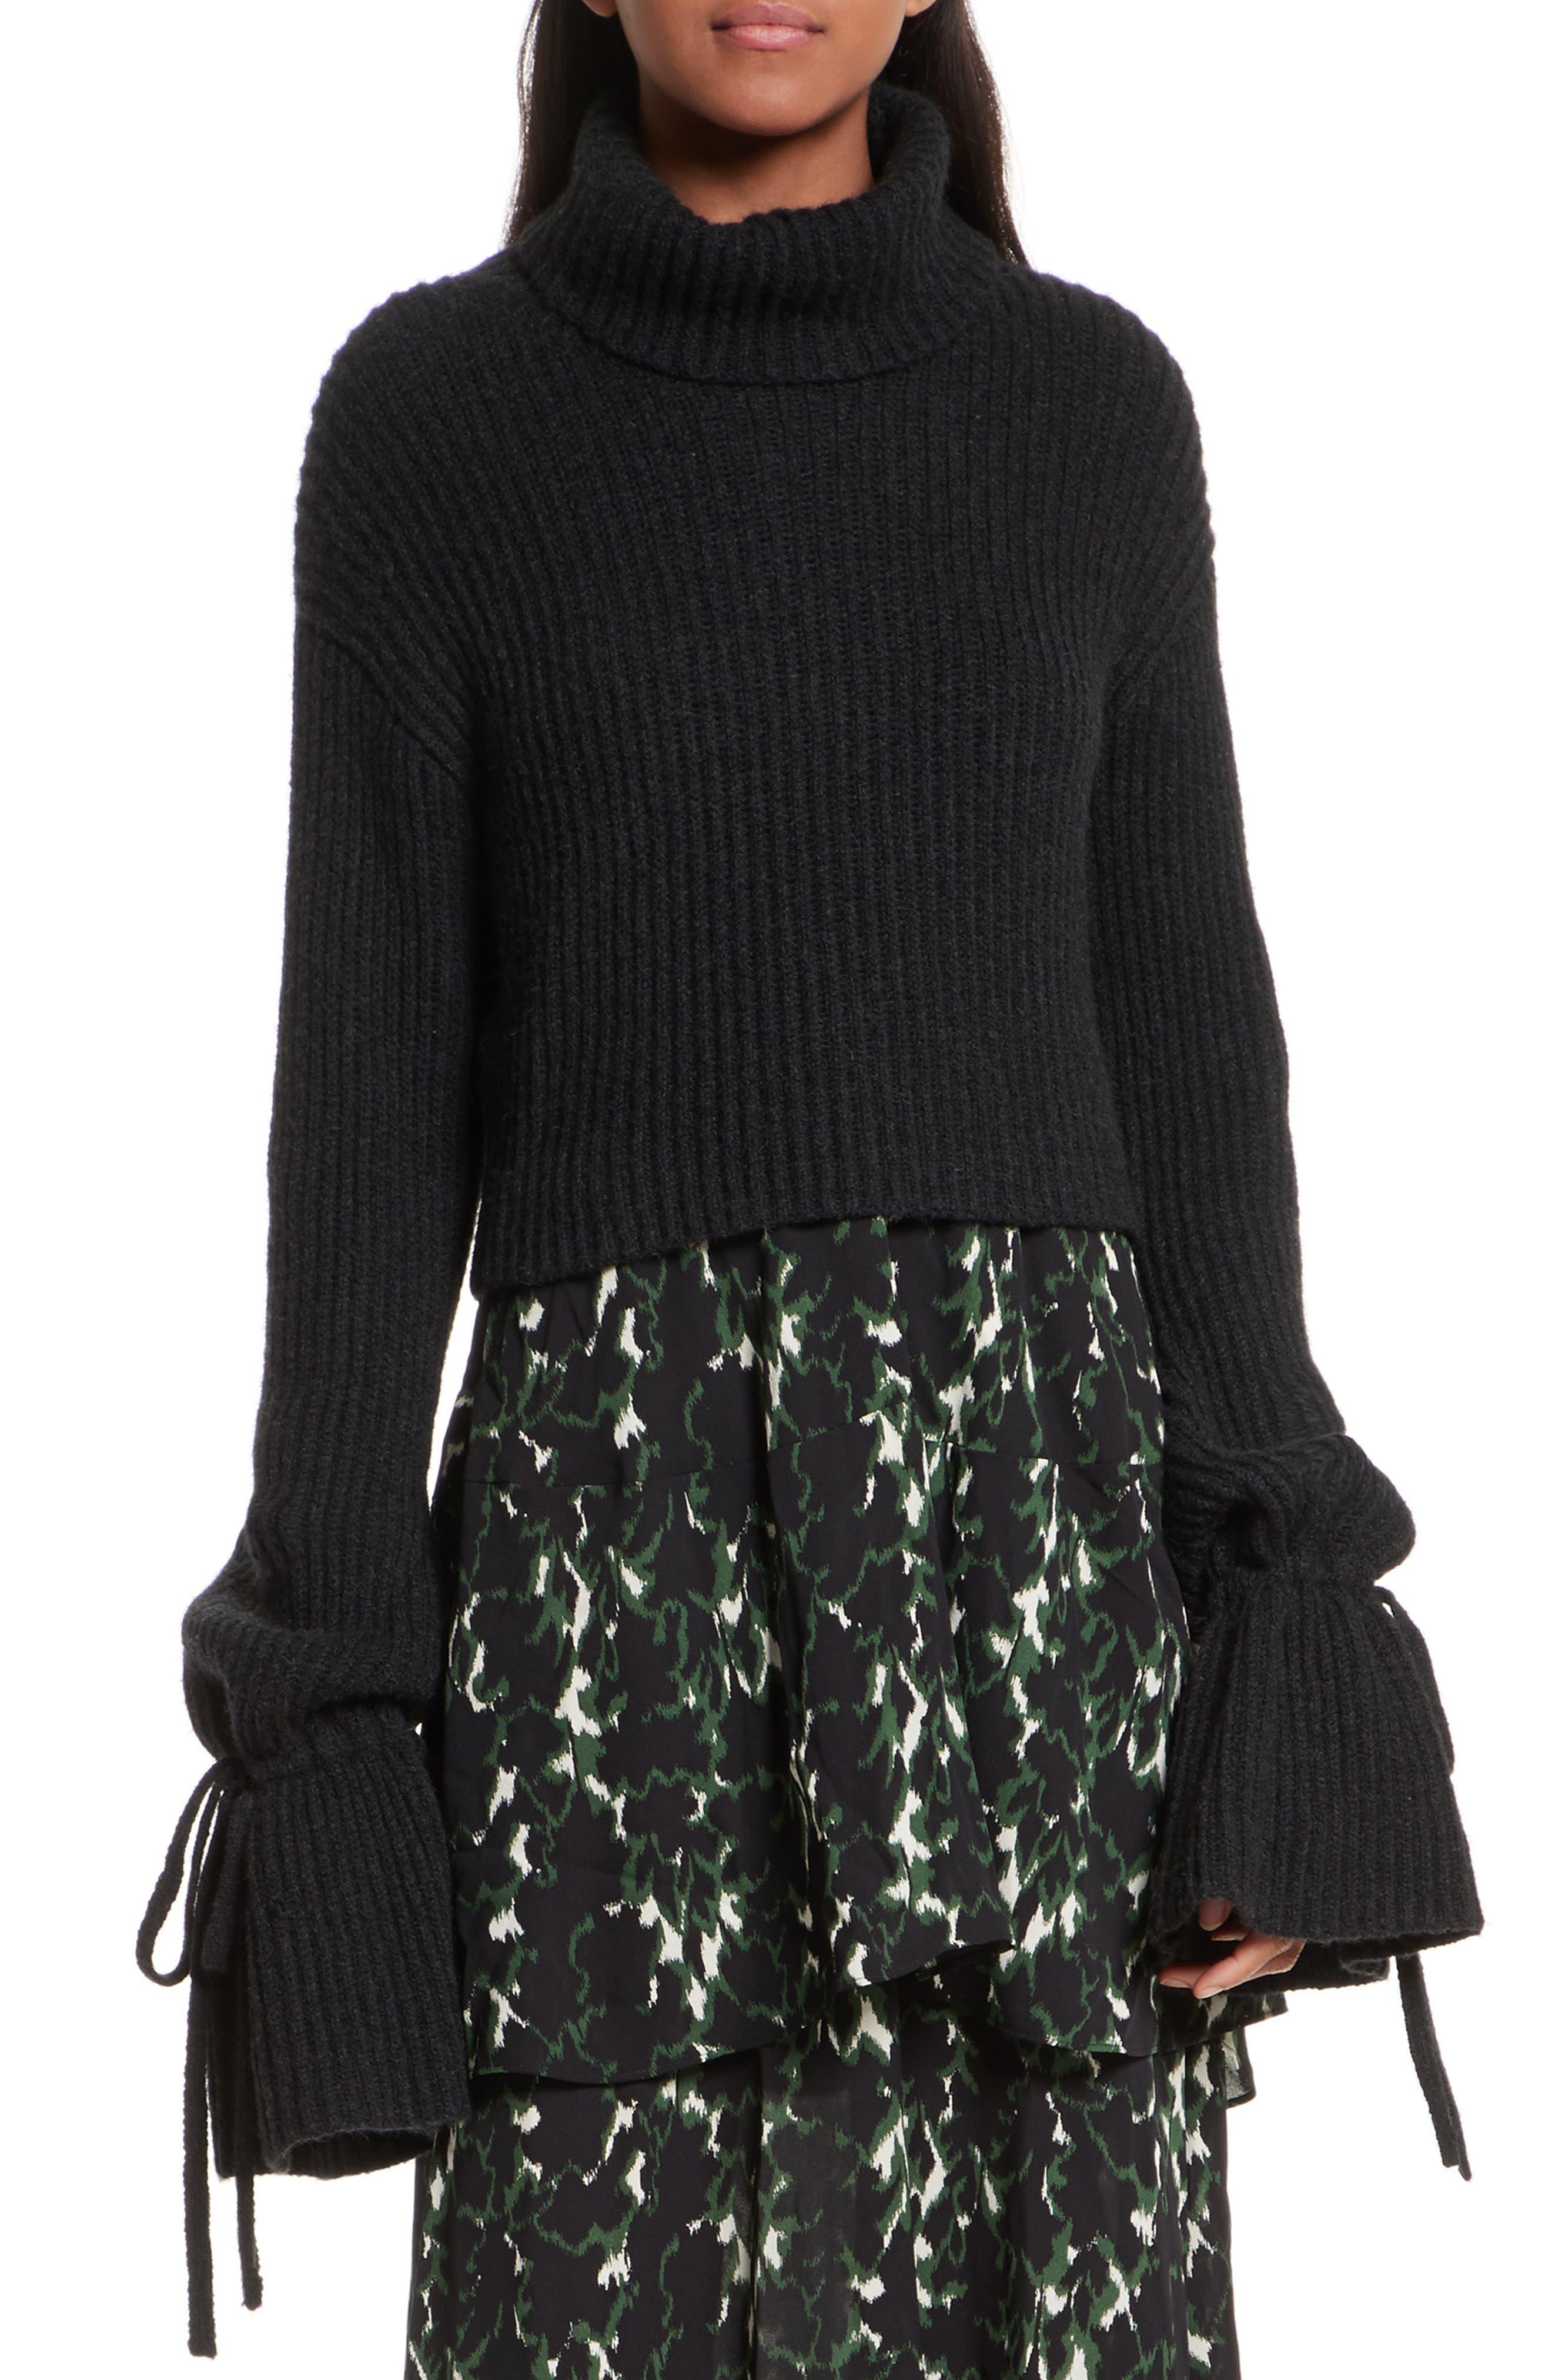 A.L.C. Emilie Wool & Camel Hair Turtleneck Sweater